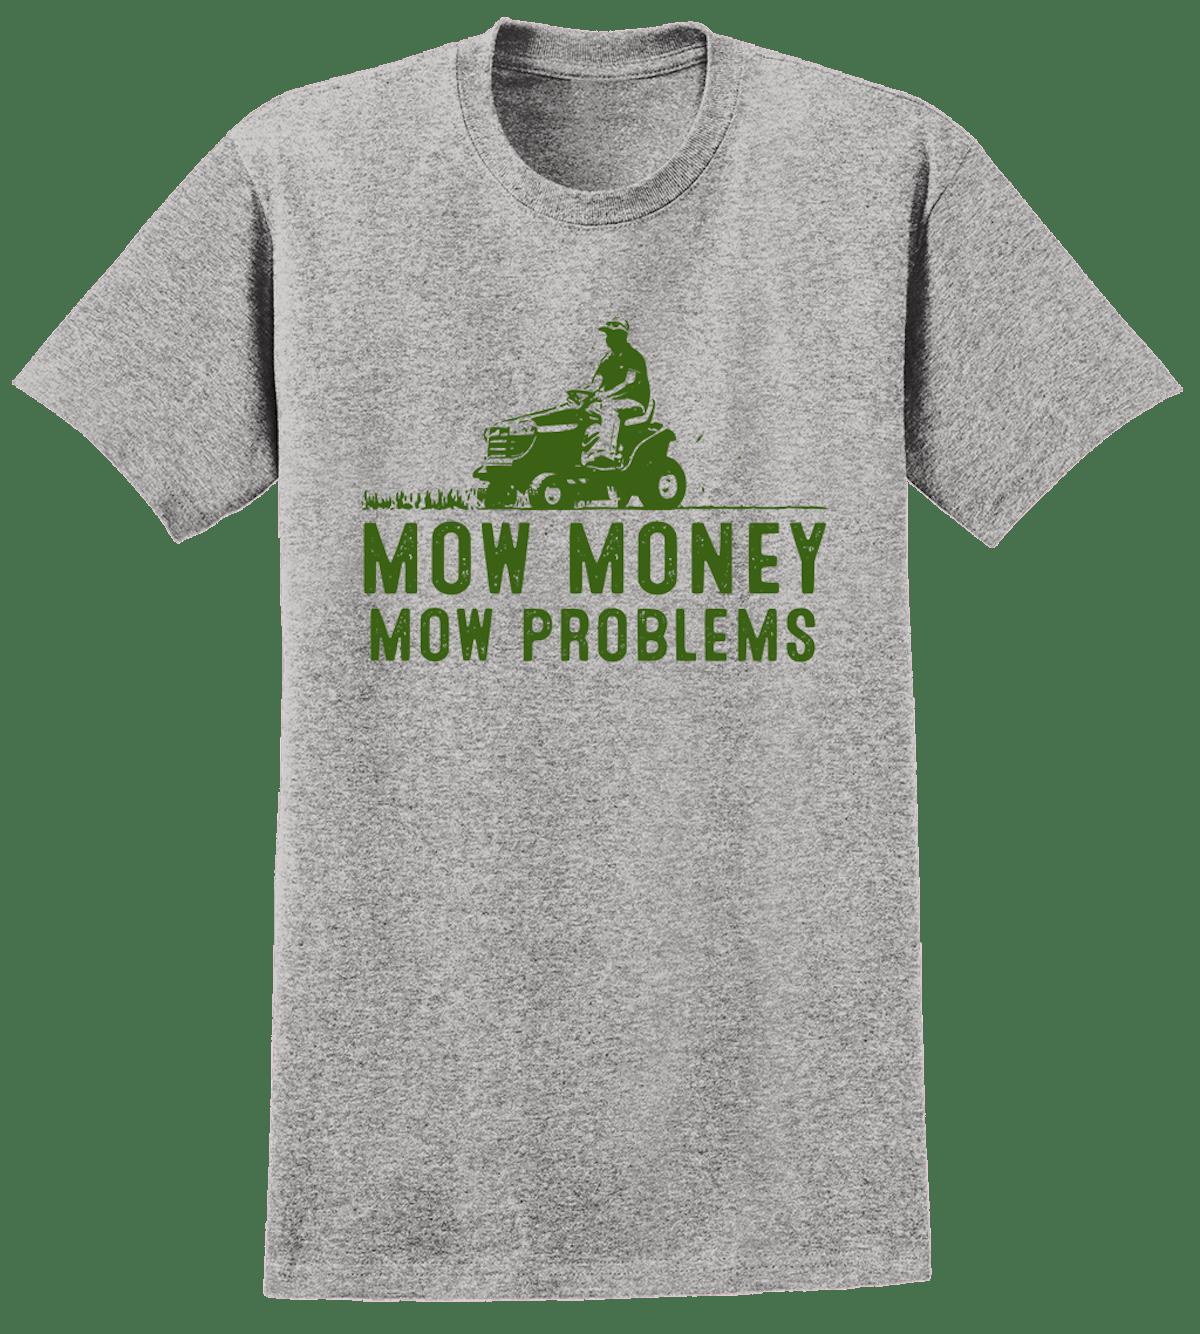 Mow Money, Mow Problems T-Shirt